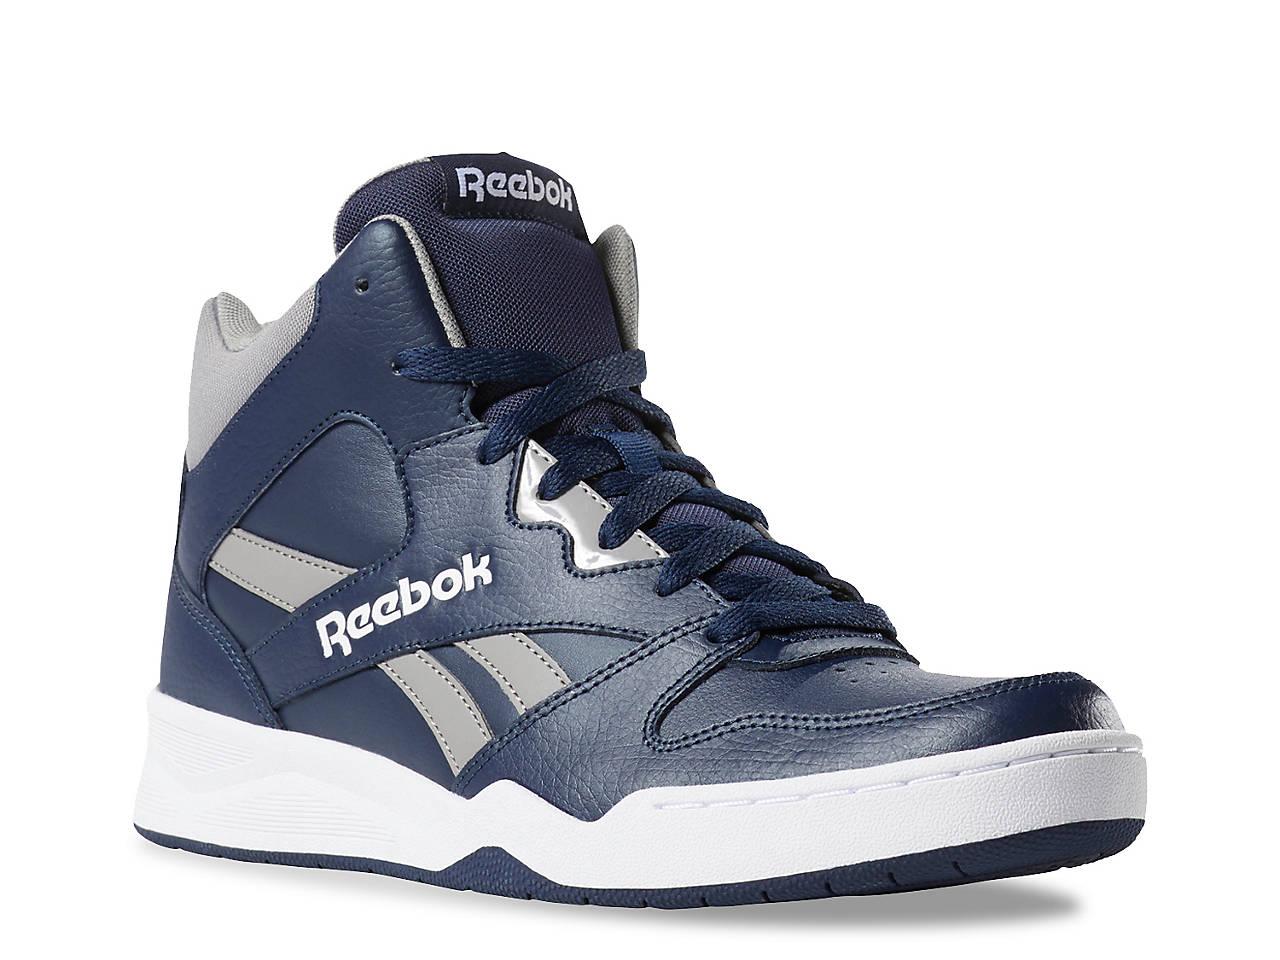 2af366b658ff70 Reebok Royal High-Top Sneaker - Men s Men s Shoes